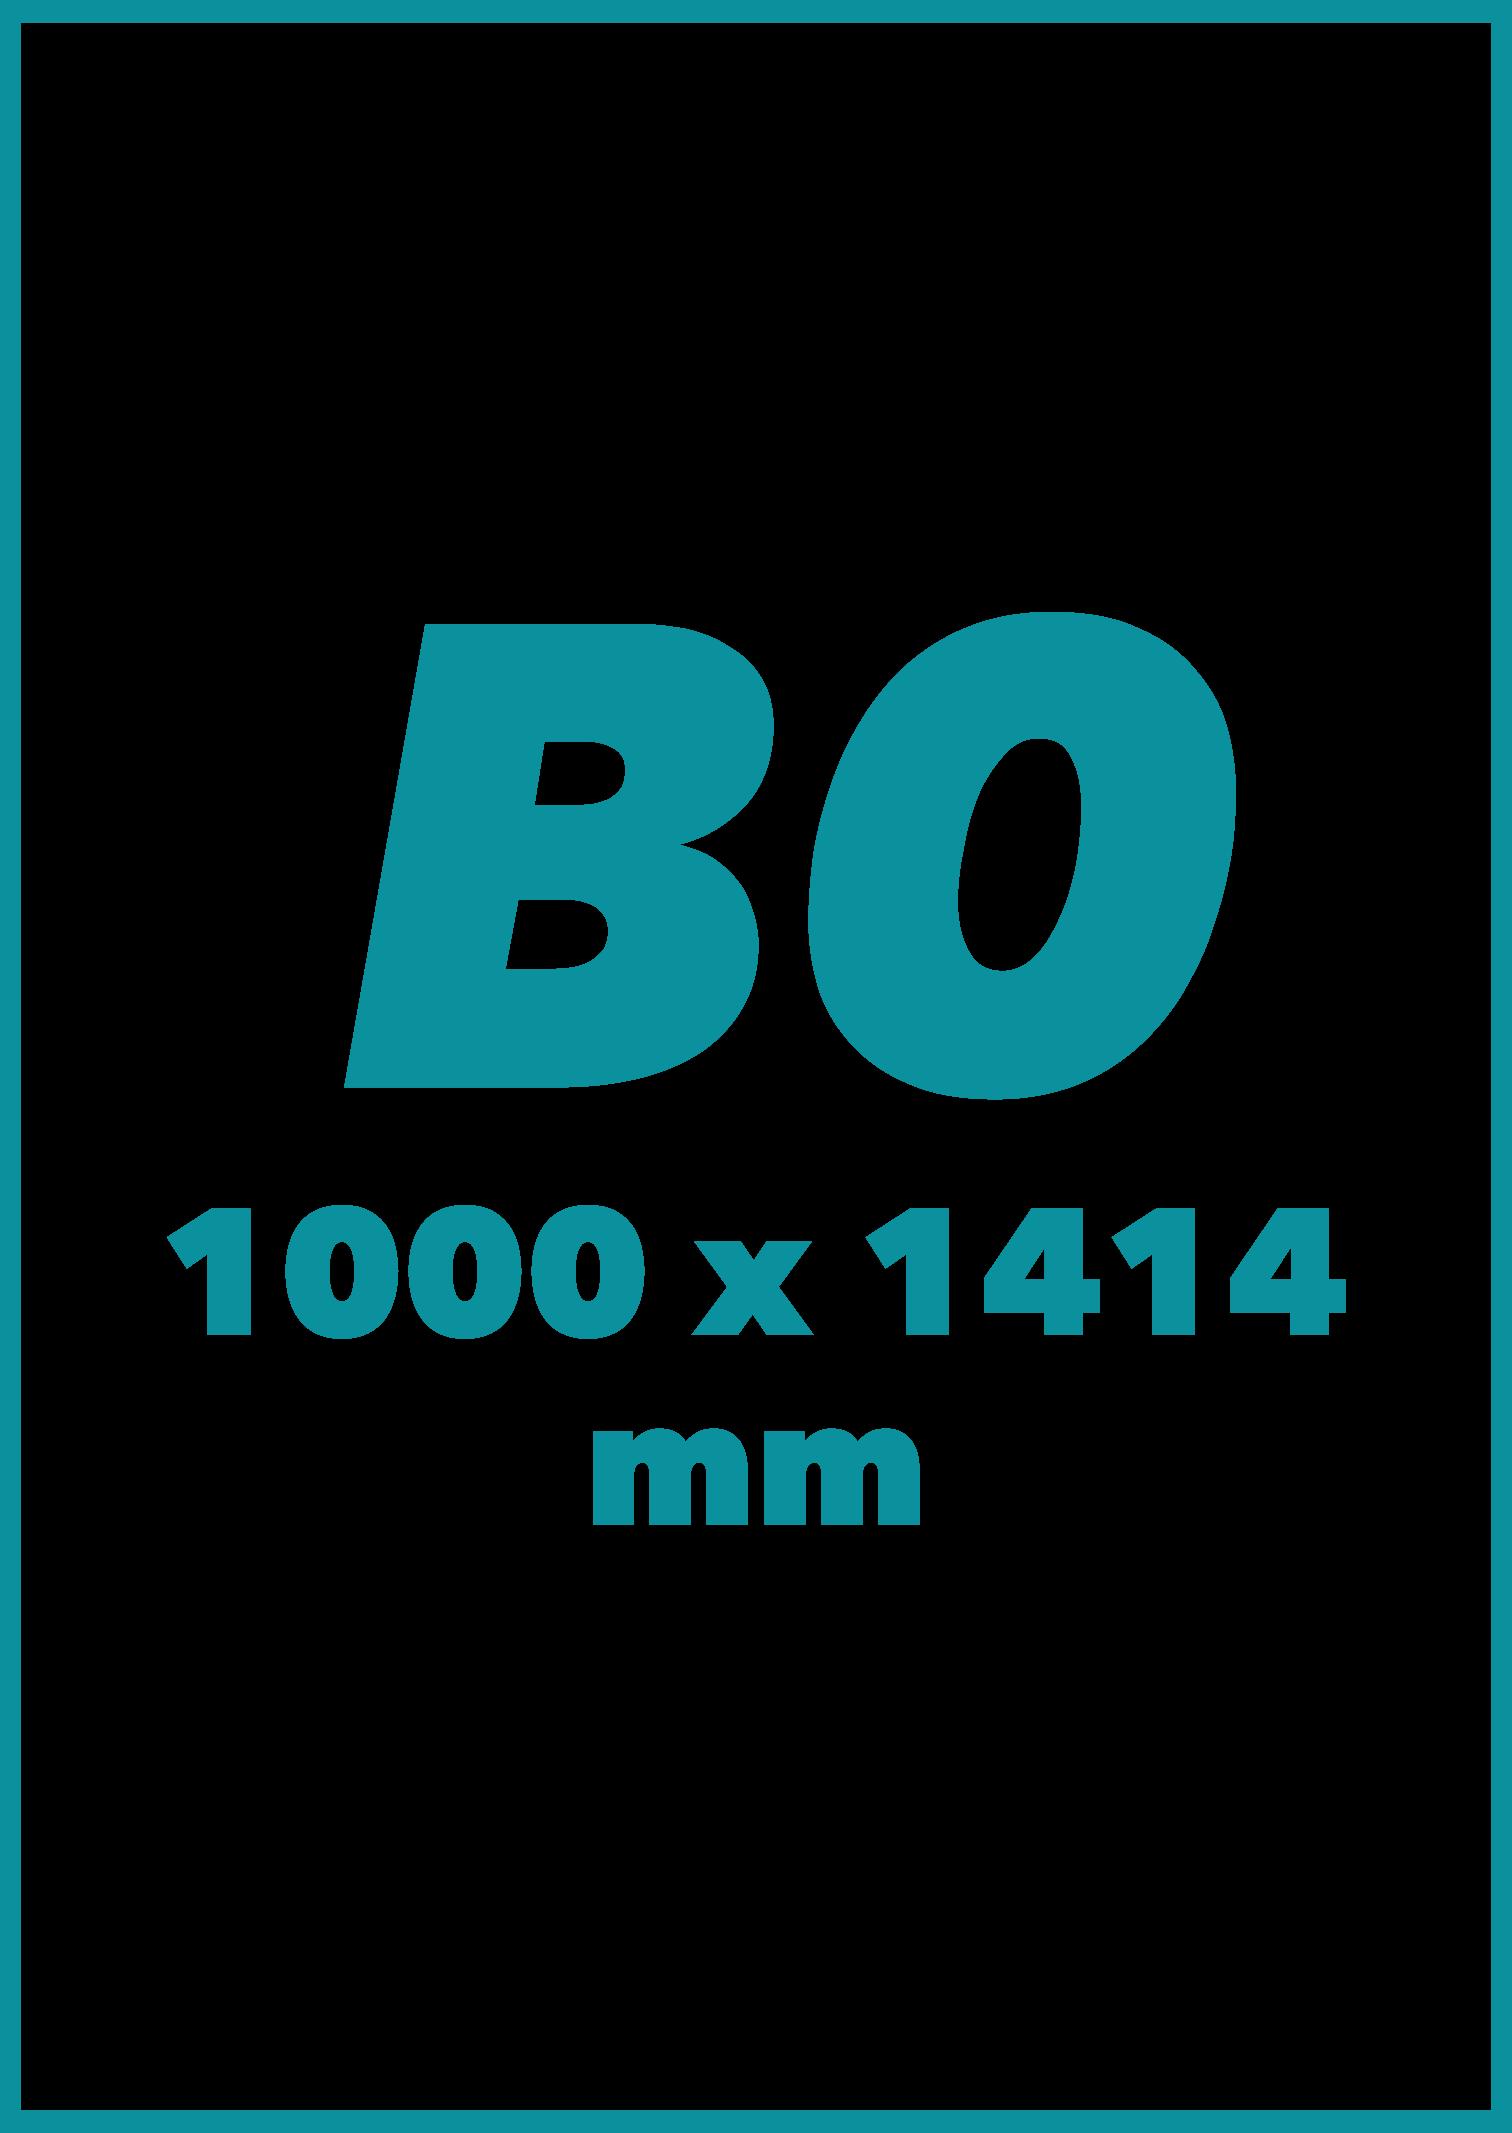 B0 Formatas